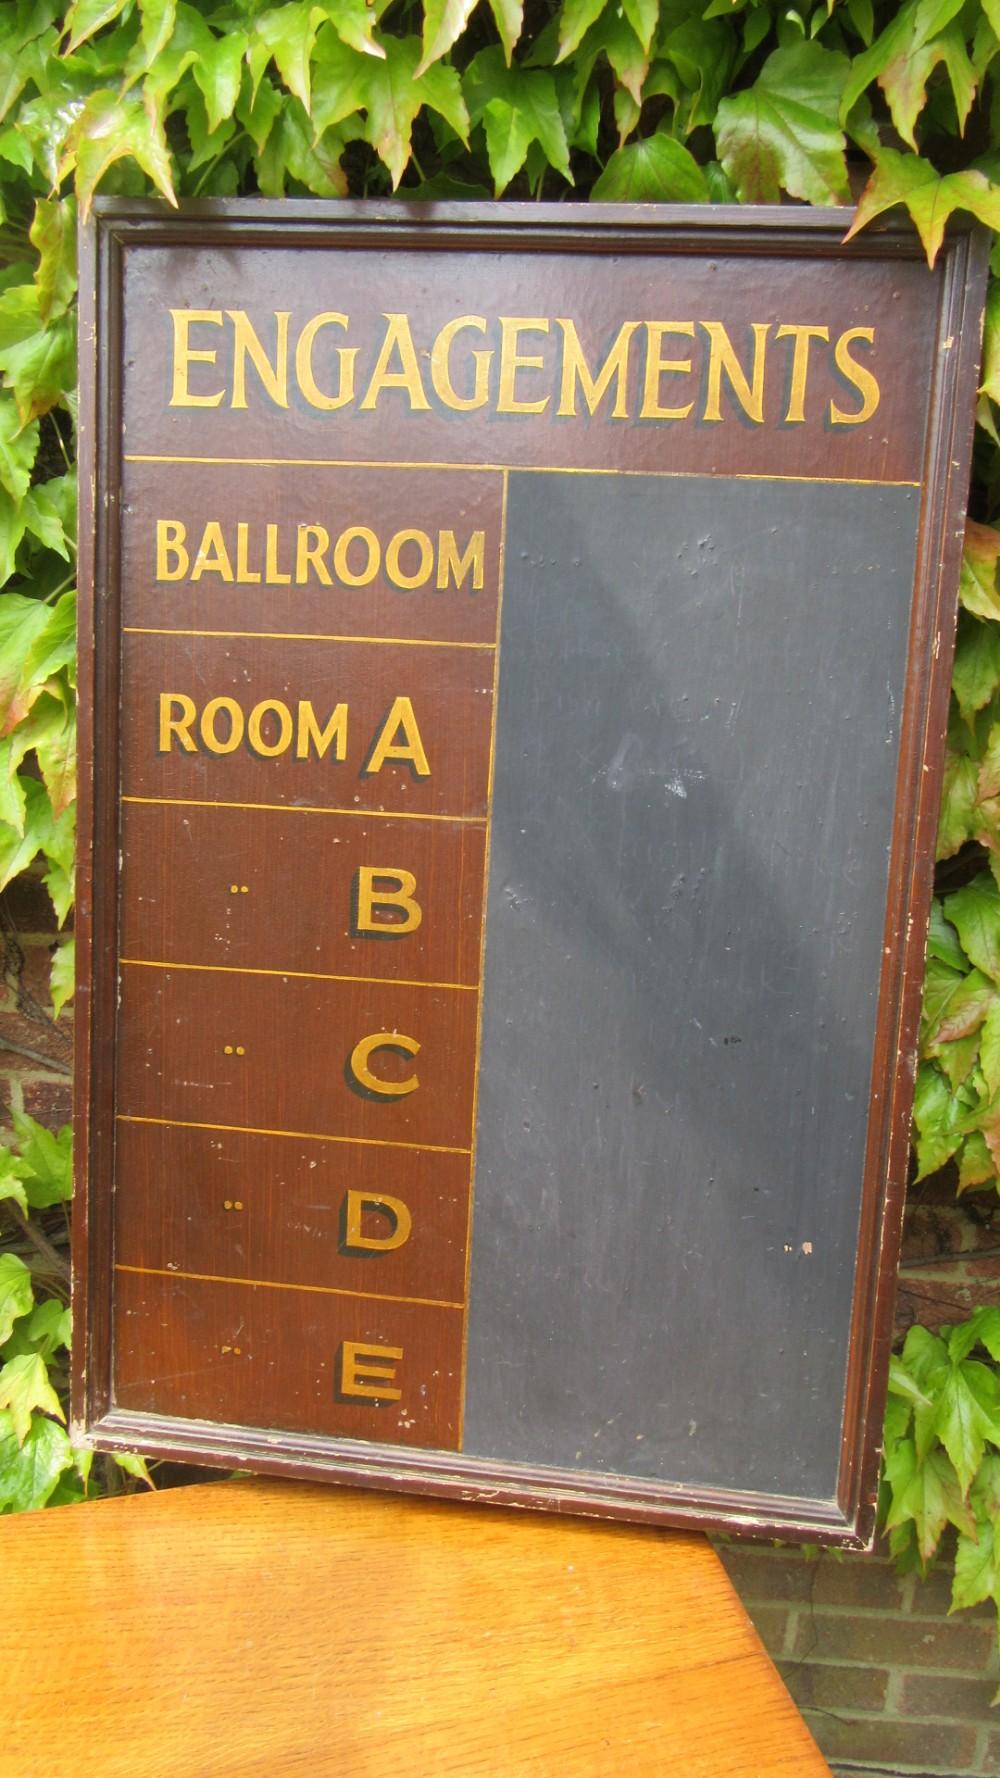 antique ballroom engagements black board